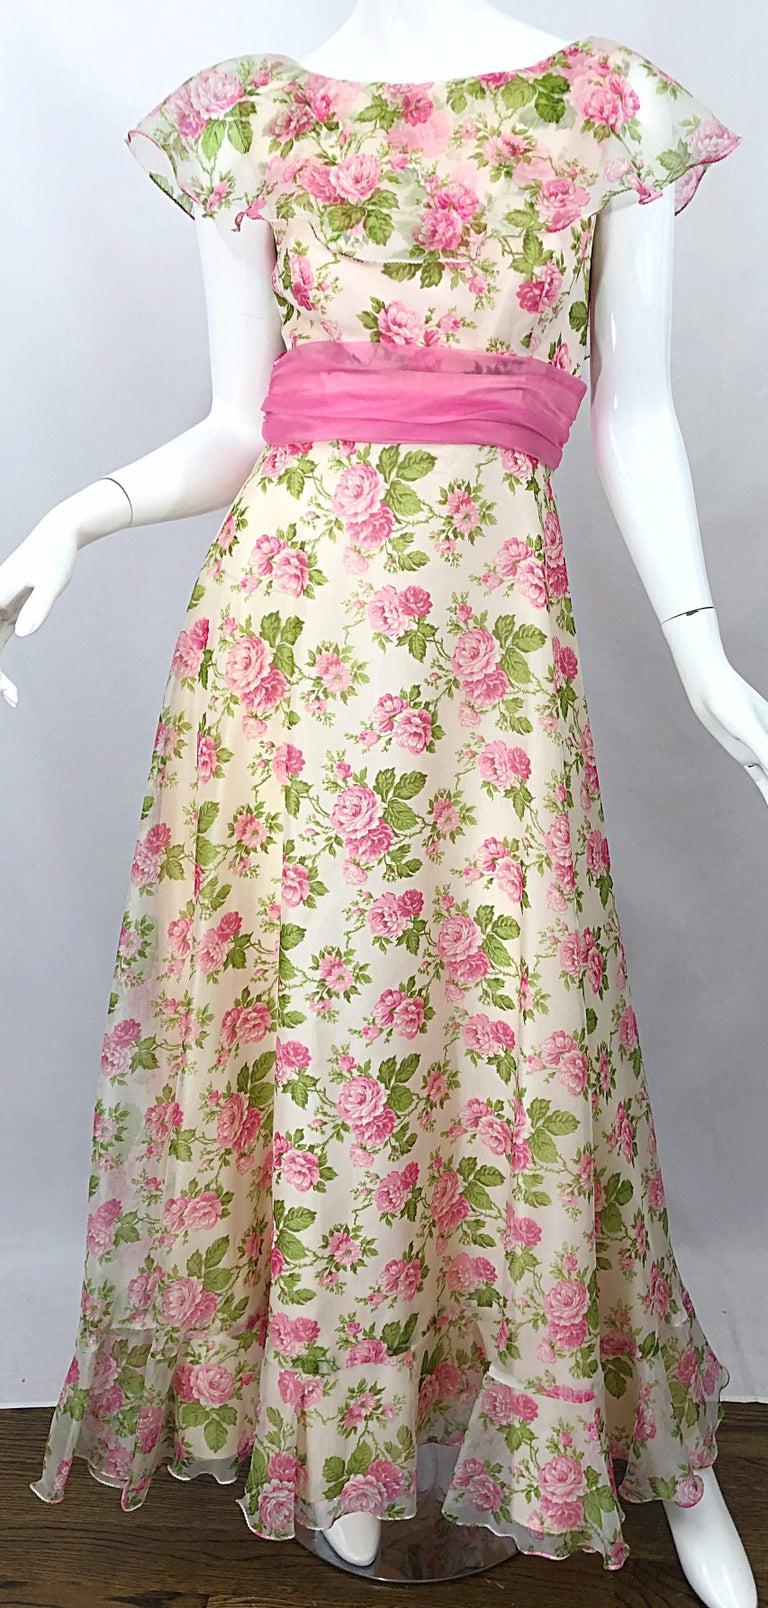 Sylvia Ann 1970s Rose Print Pink Ivory Chiffon Vintage 70s Maxi Dress Gown In 2021 70s Maxi Dress Prom Dresses Vintage Dresses [ 1608 x 768 Pixel ]